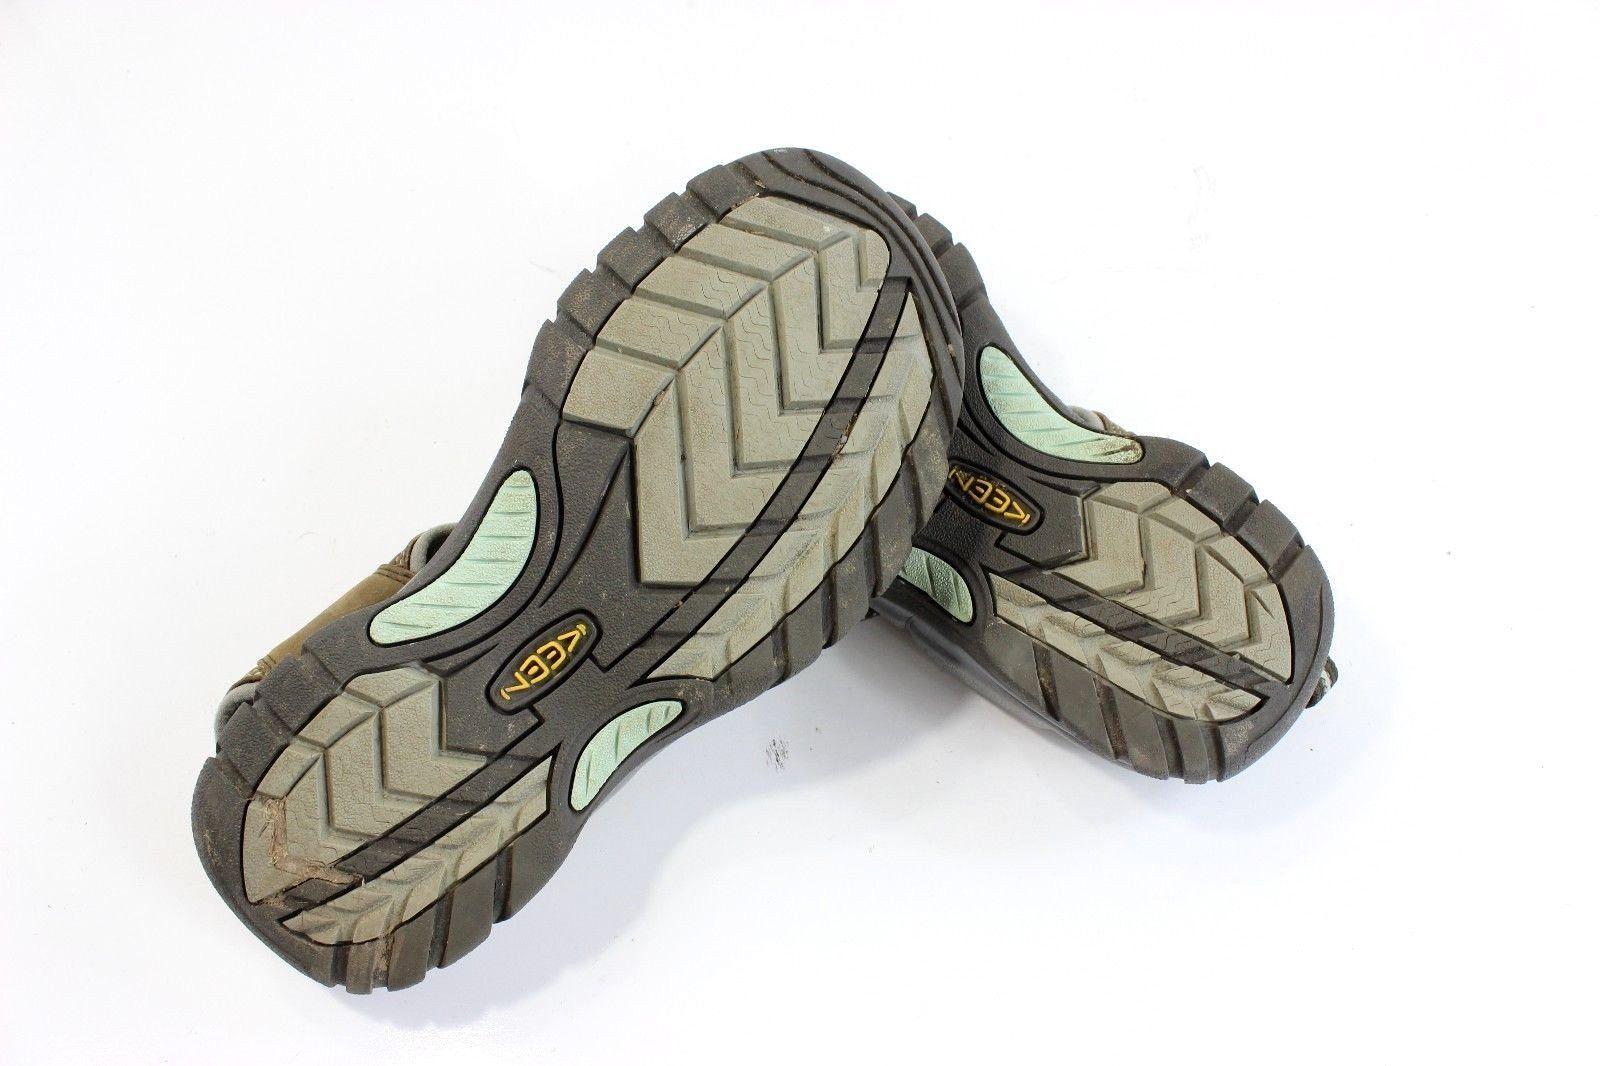 Keen Venice Brown Leather Waterproof Sport Sandals Shoe 5210 Womens 7.5 Eu 38